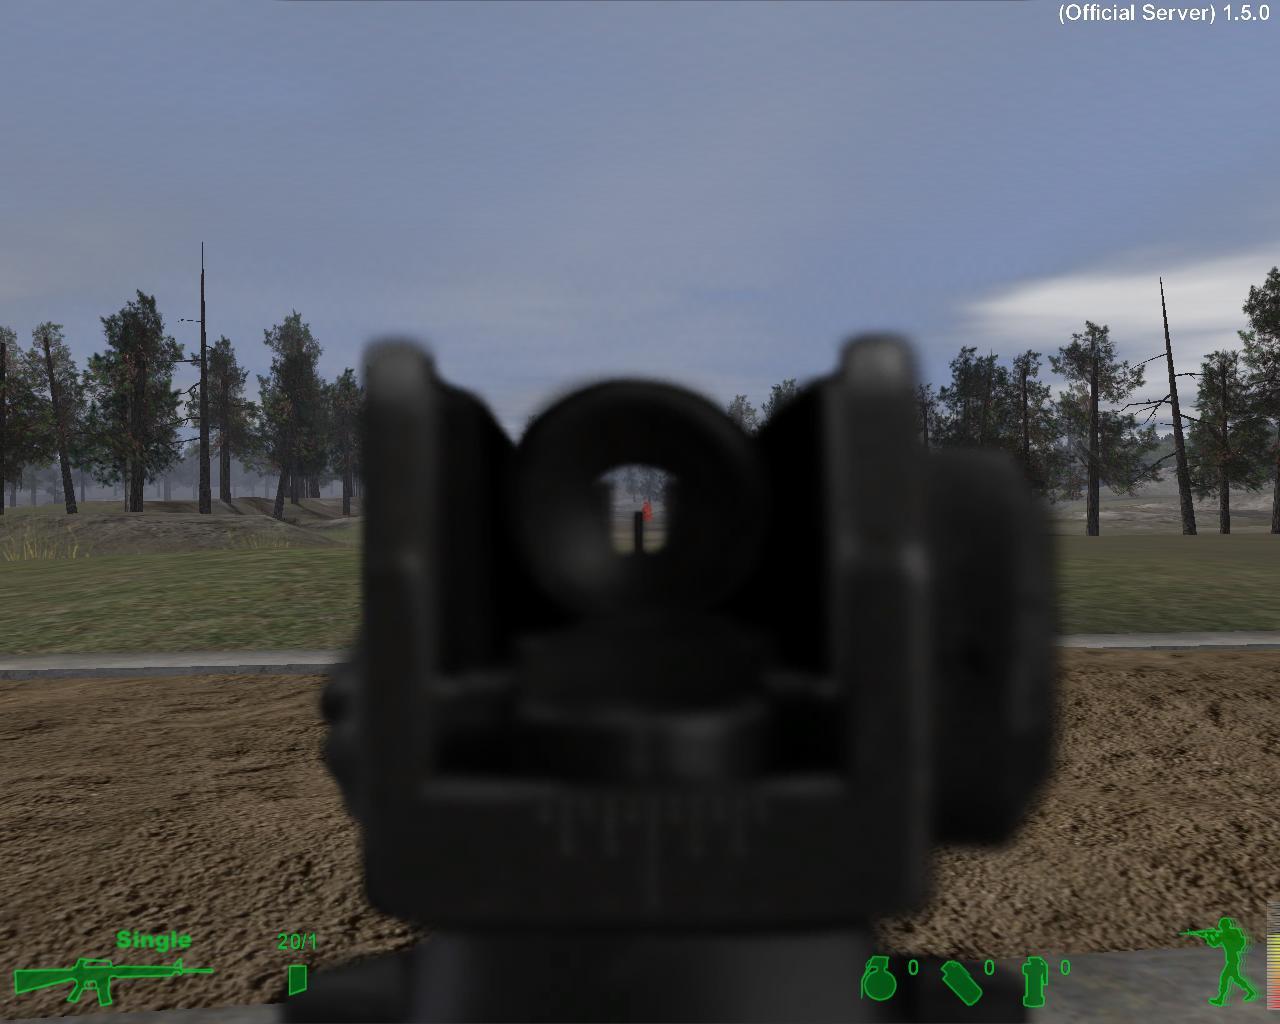 aa_scope.jpg